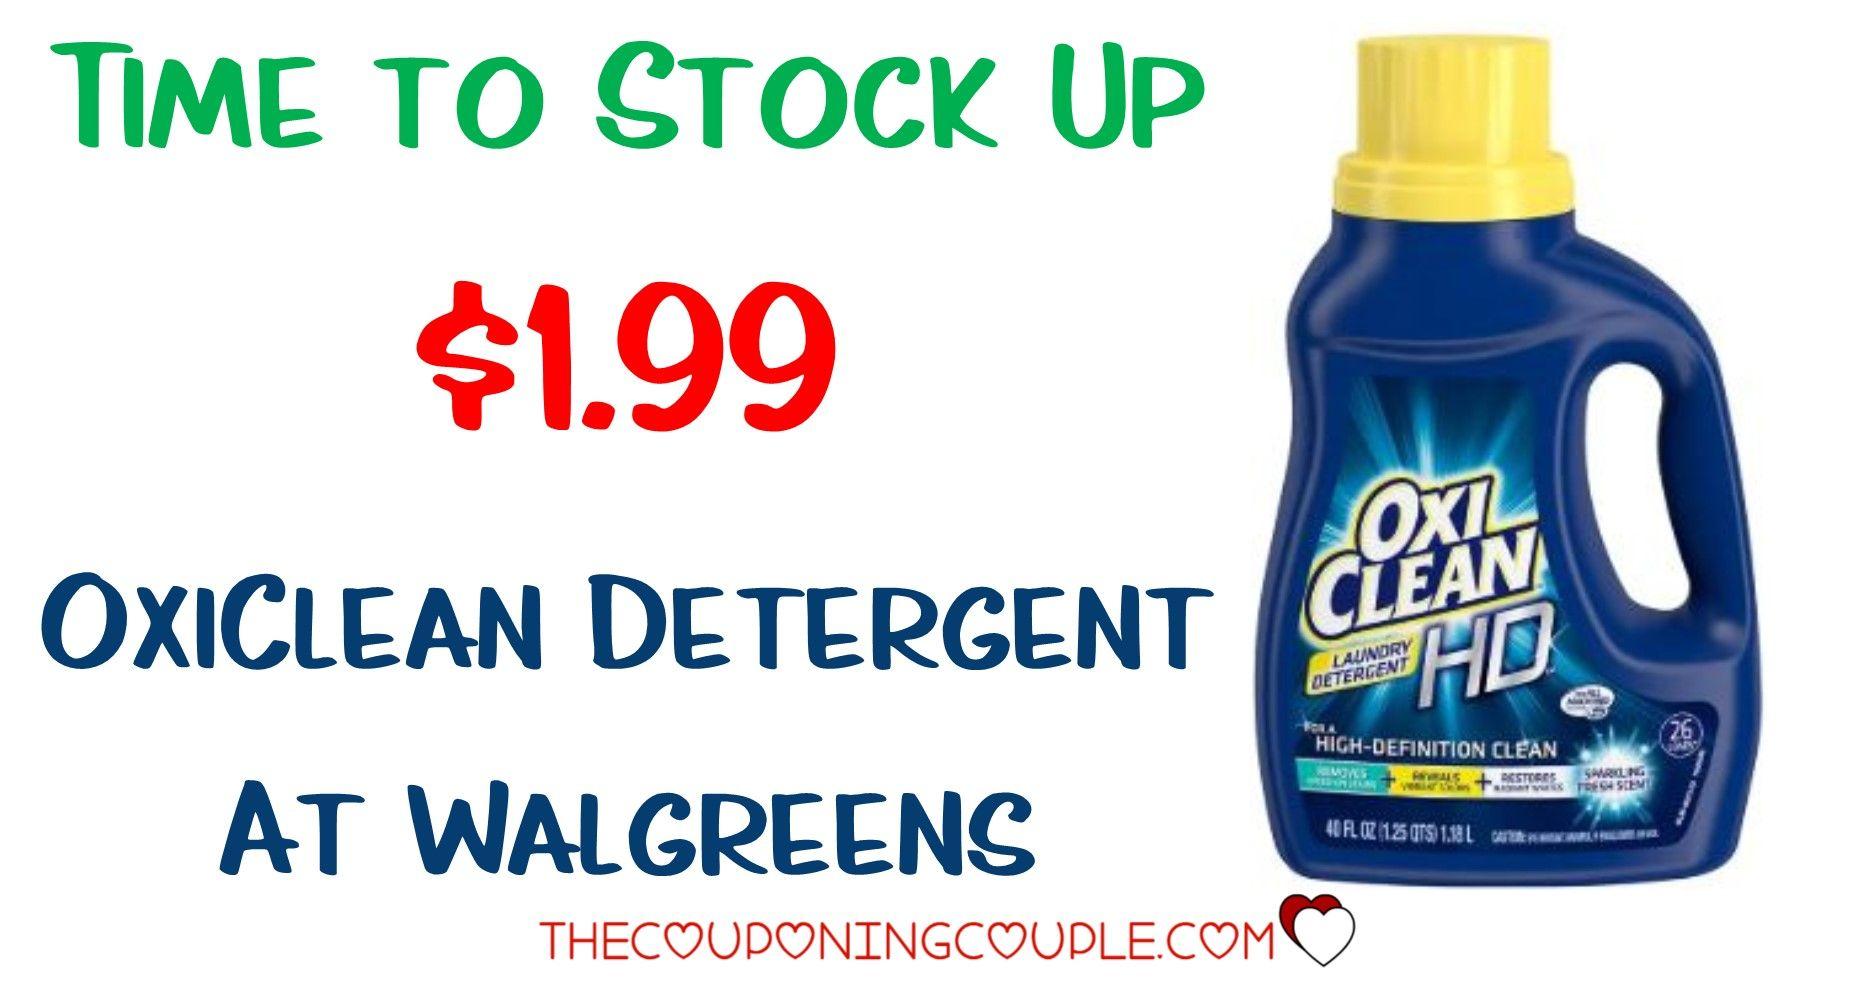 Cheap Oxiclean Hd Laundry Detergent Deal Cvs Walgreens Riteaid